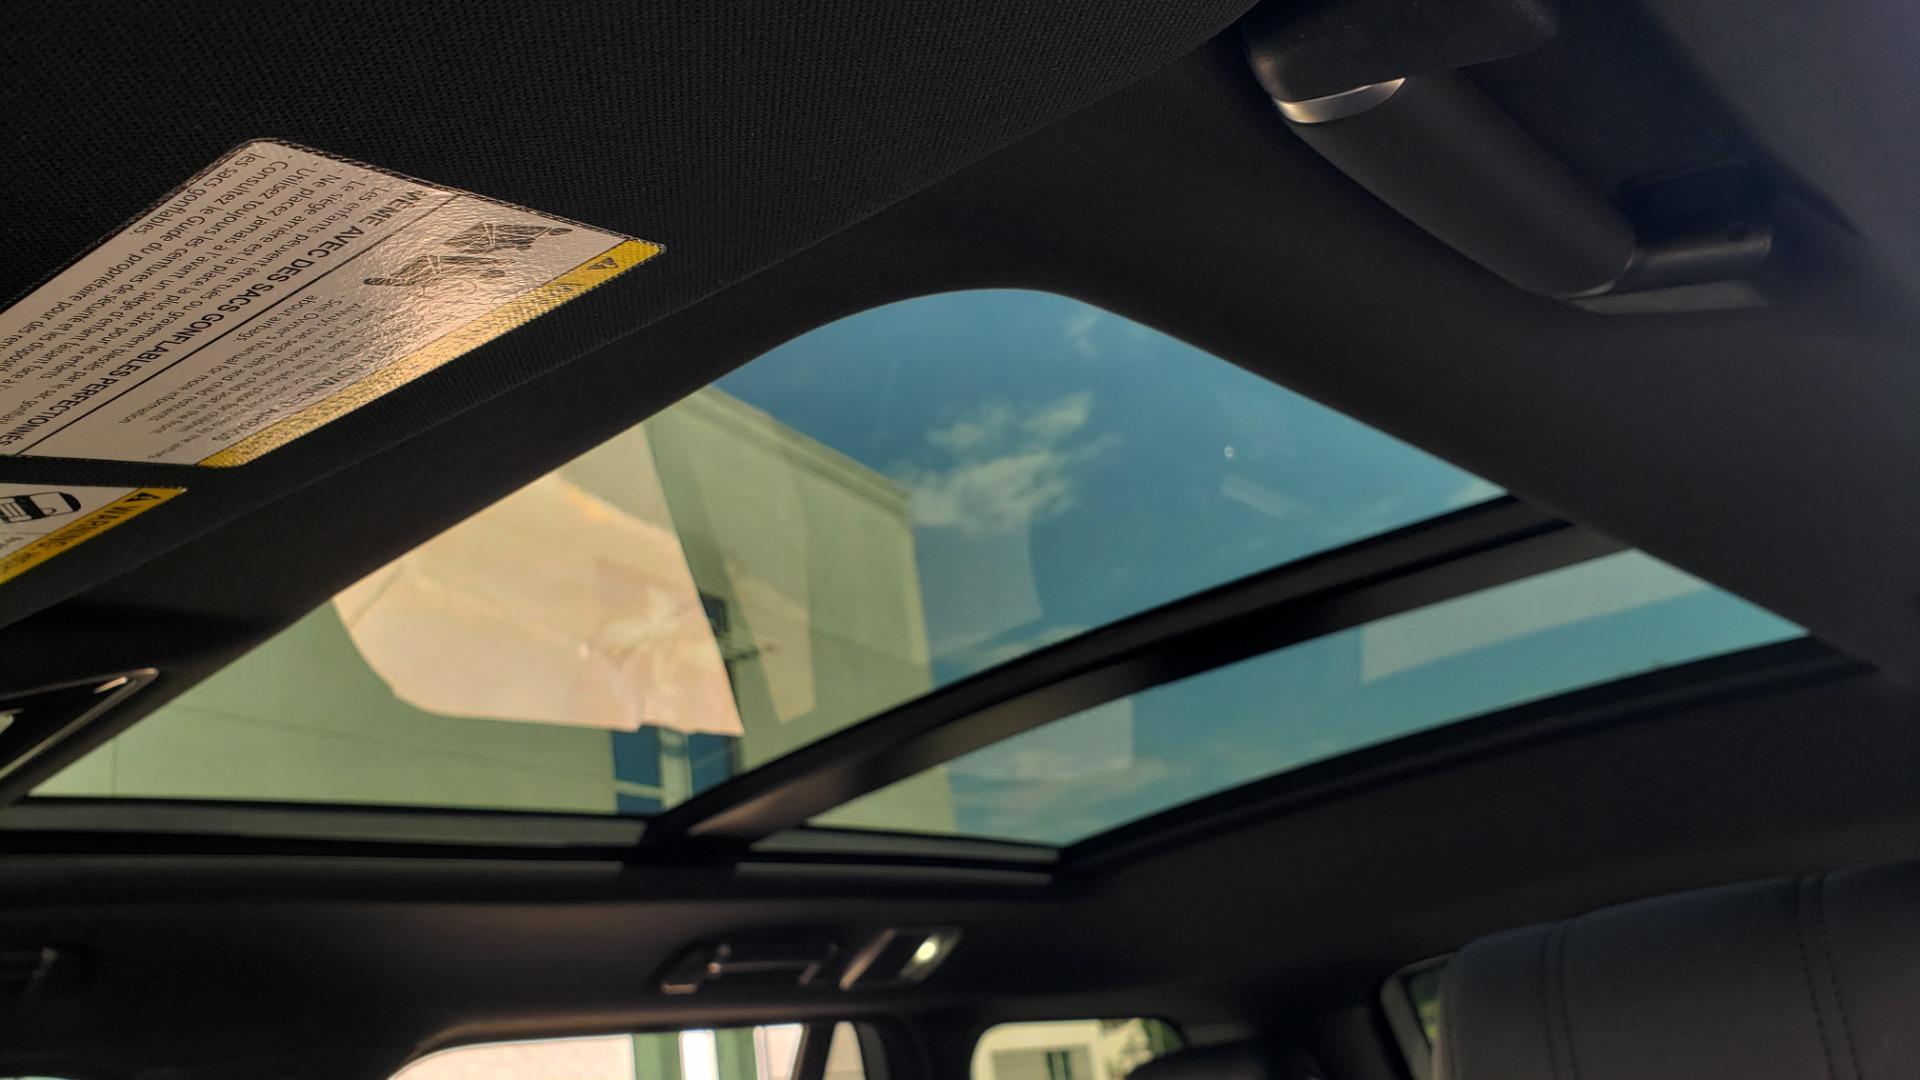 Used 2017 Land Rover RANGE ROVER SC V8 / VISION ASST / DRIVE PKG / MERIDIAN SOUND / PANO-ROOF / NAV / BSM for sale $75,995 at Formula Imports in Charlotte NC 28227 63